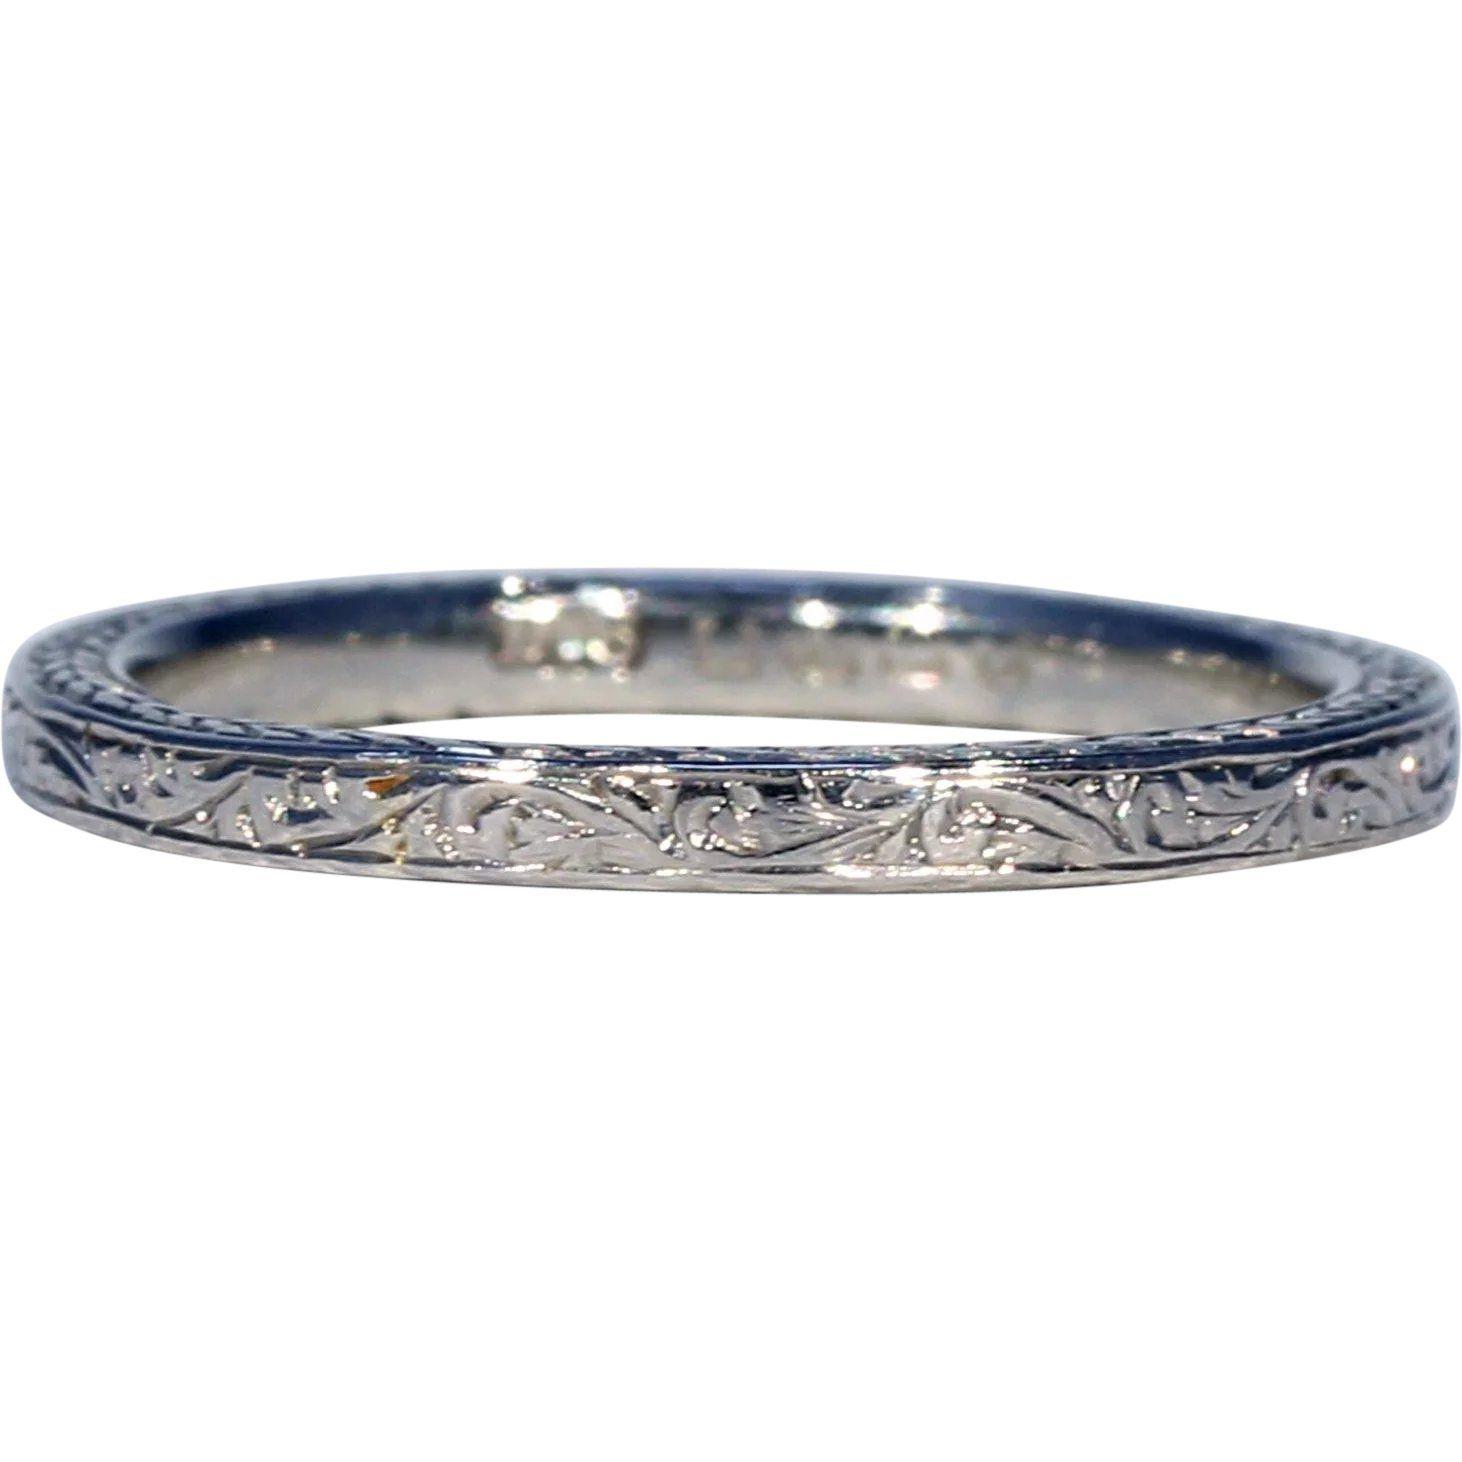 Art deco 18k white gold engraved wedding band ring